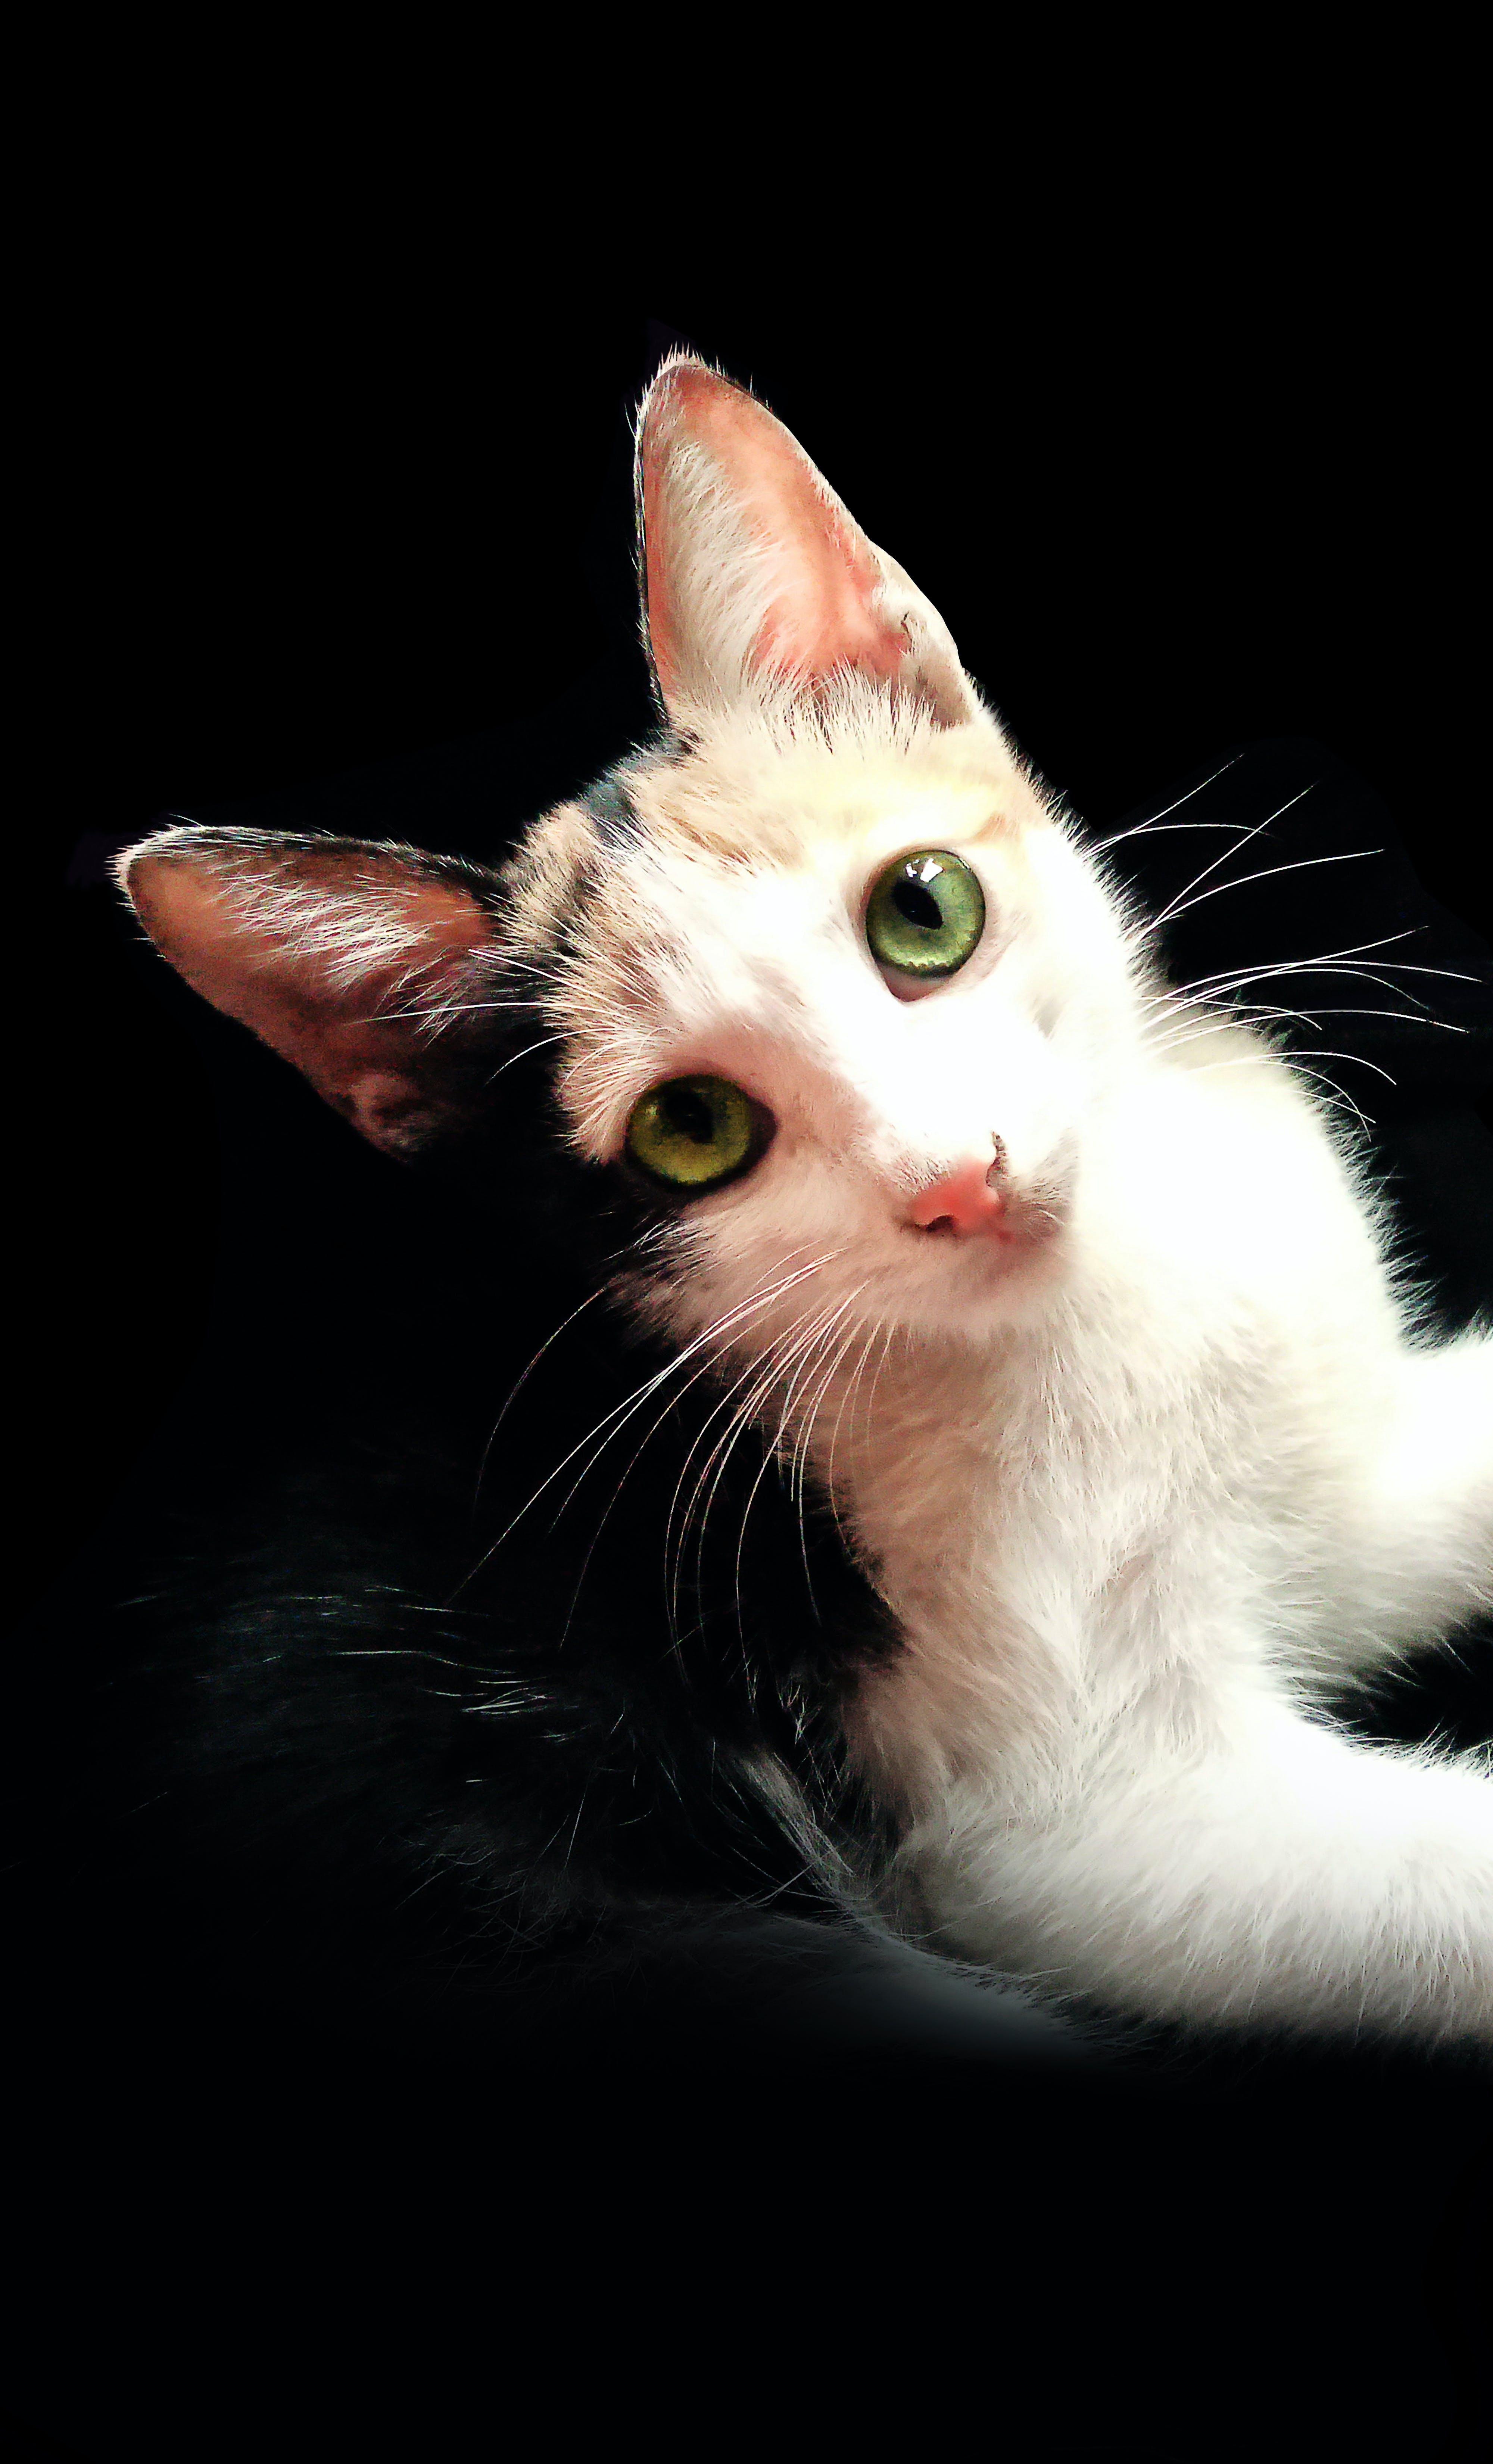 Free stock photo of black background, cat, cat eye, cat face